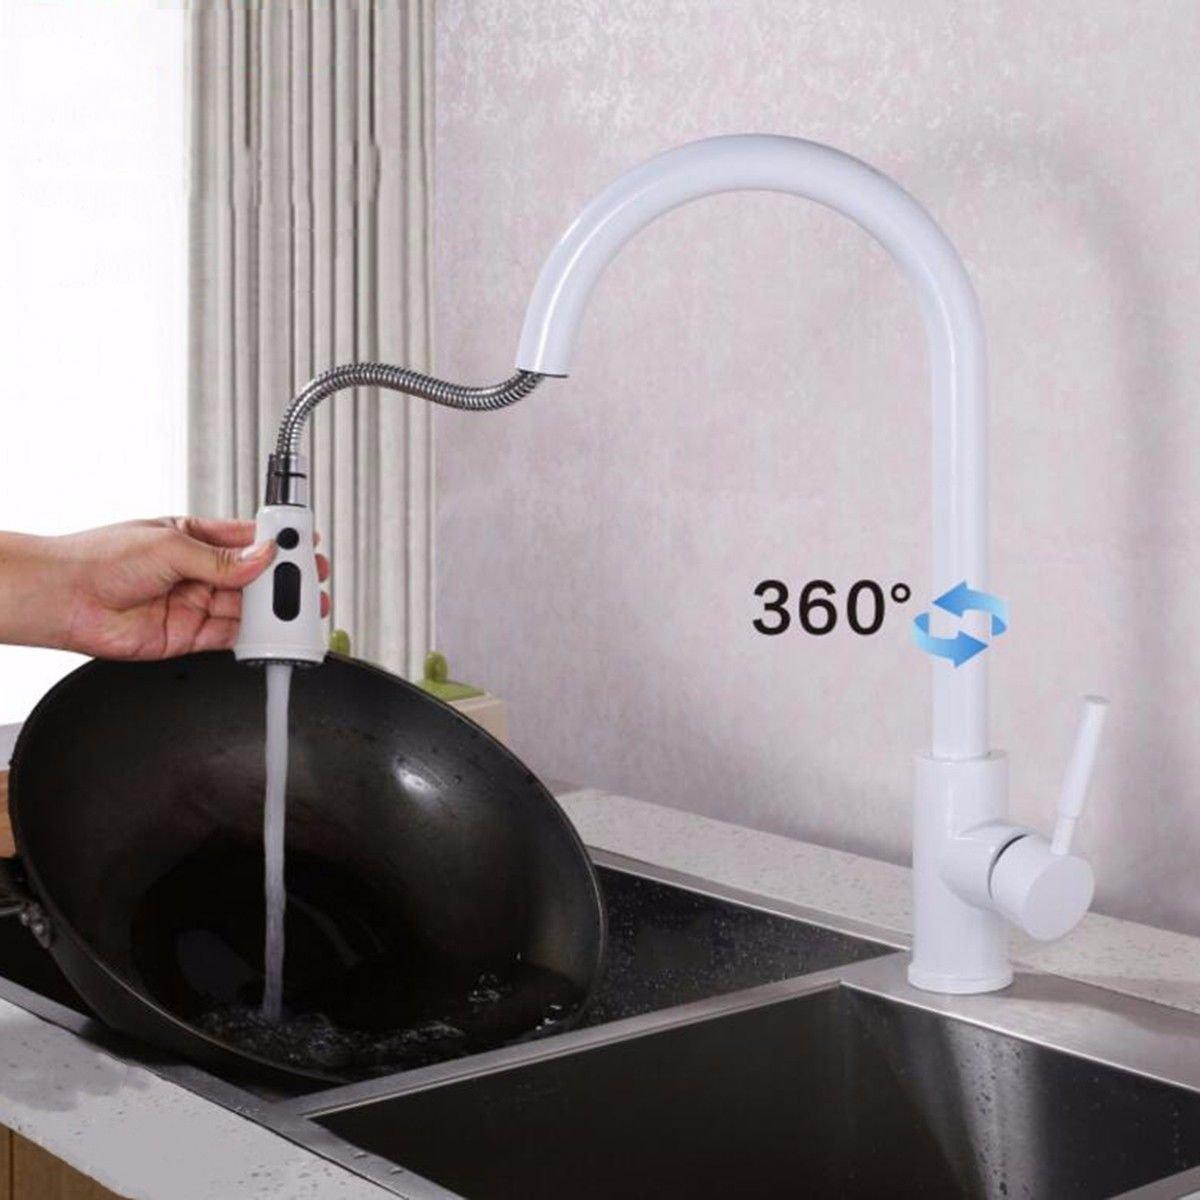 C1 MulFaucet Copper pullable Kitchen Faucet hot and Cold Sink Faucet Sink Matte Black Faucet A1